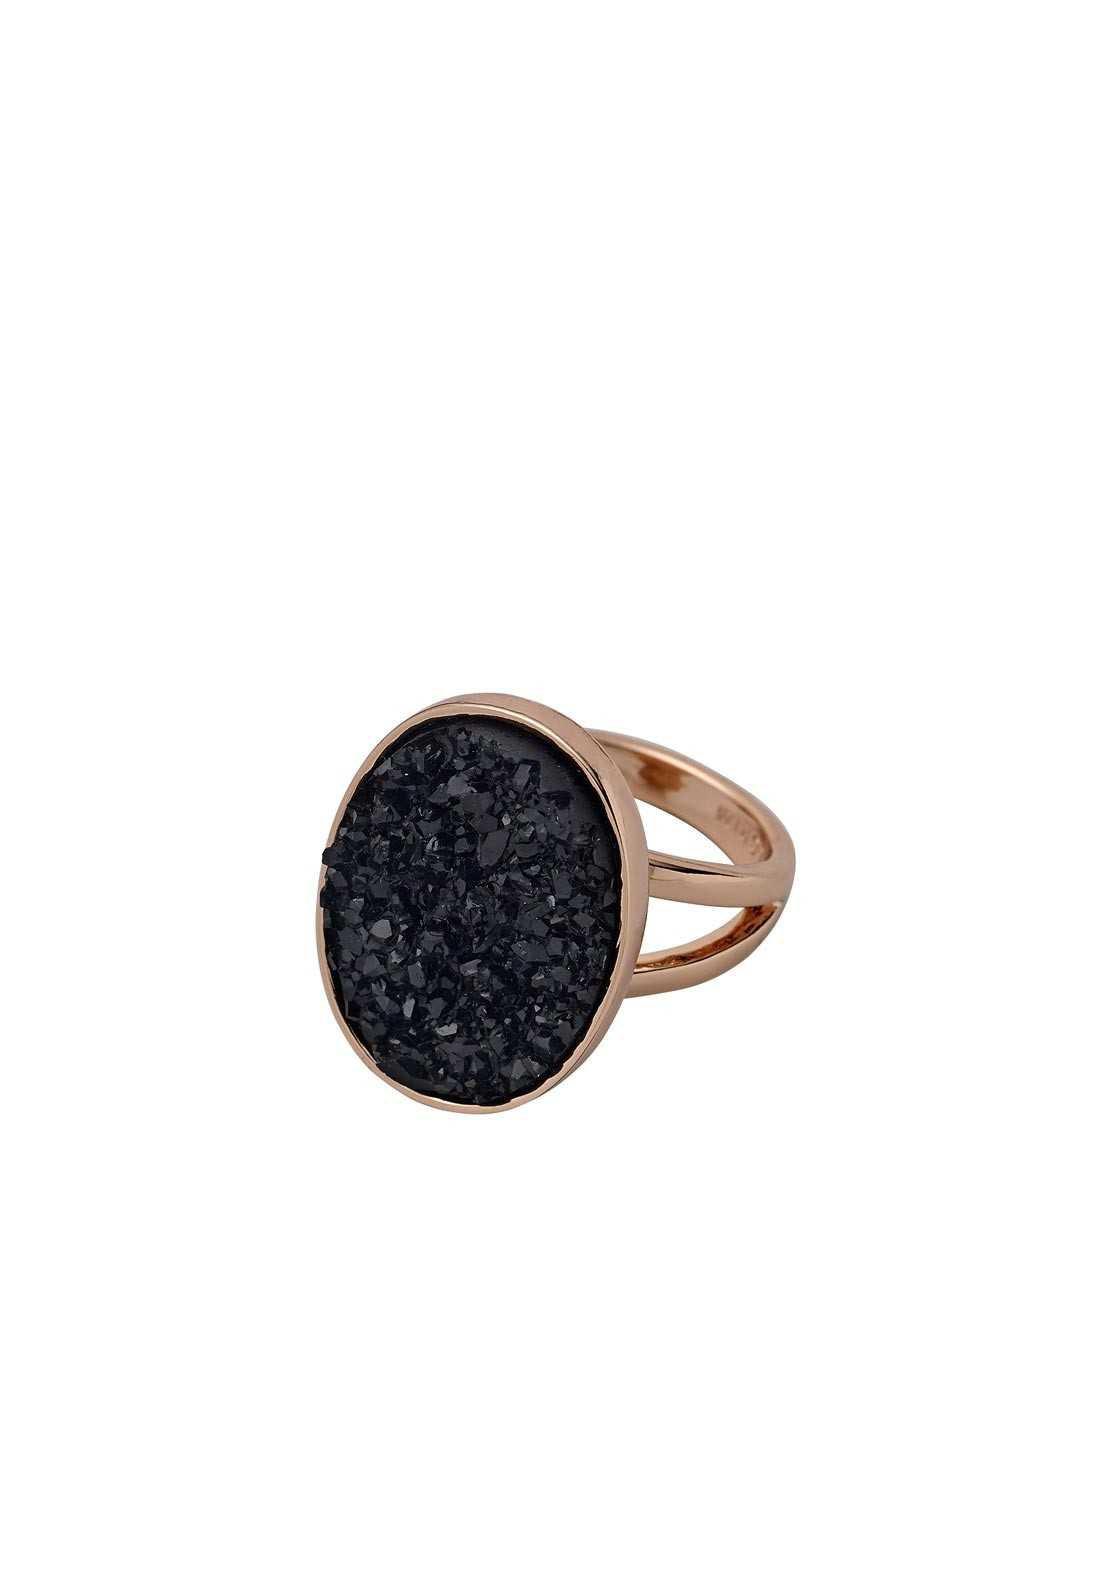 Pilgrim Adjustable Rock Ring, Rose Gold/Black | McElhinneys